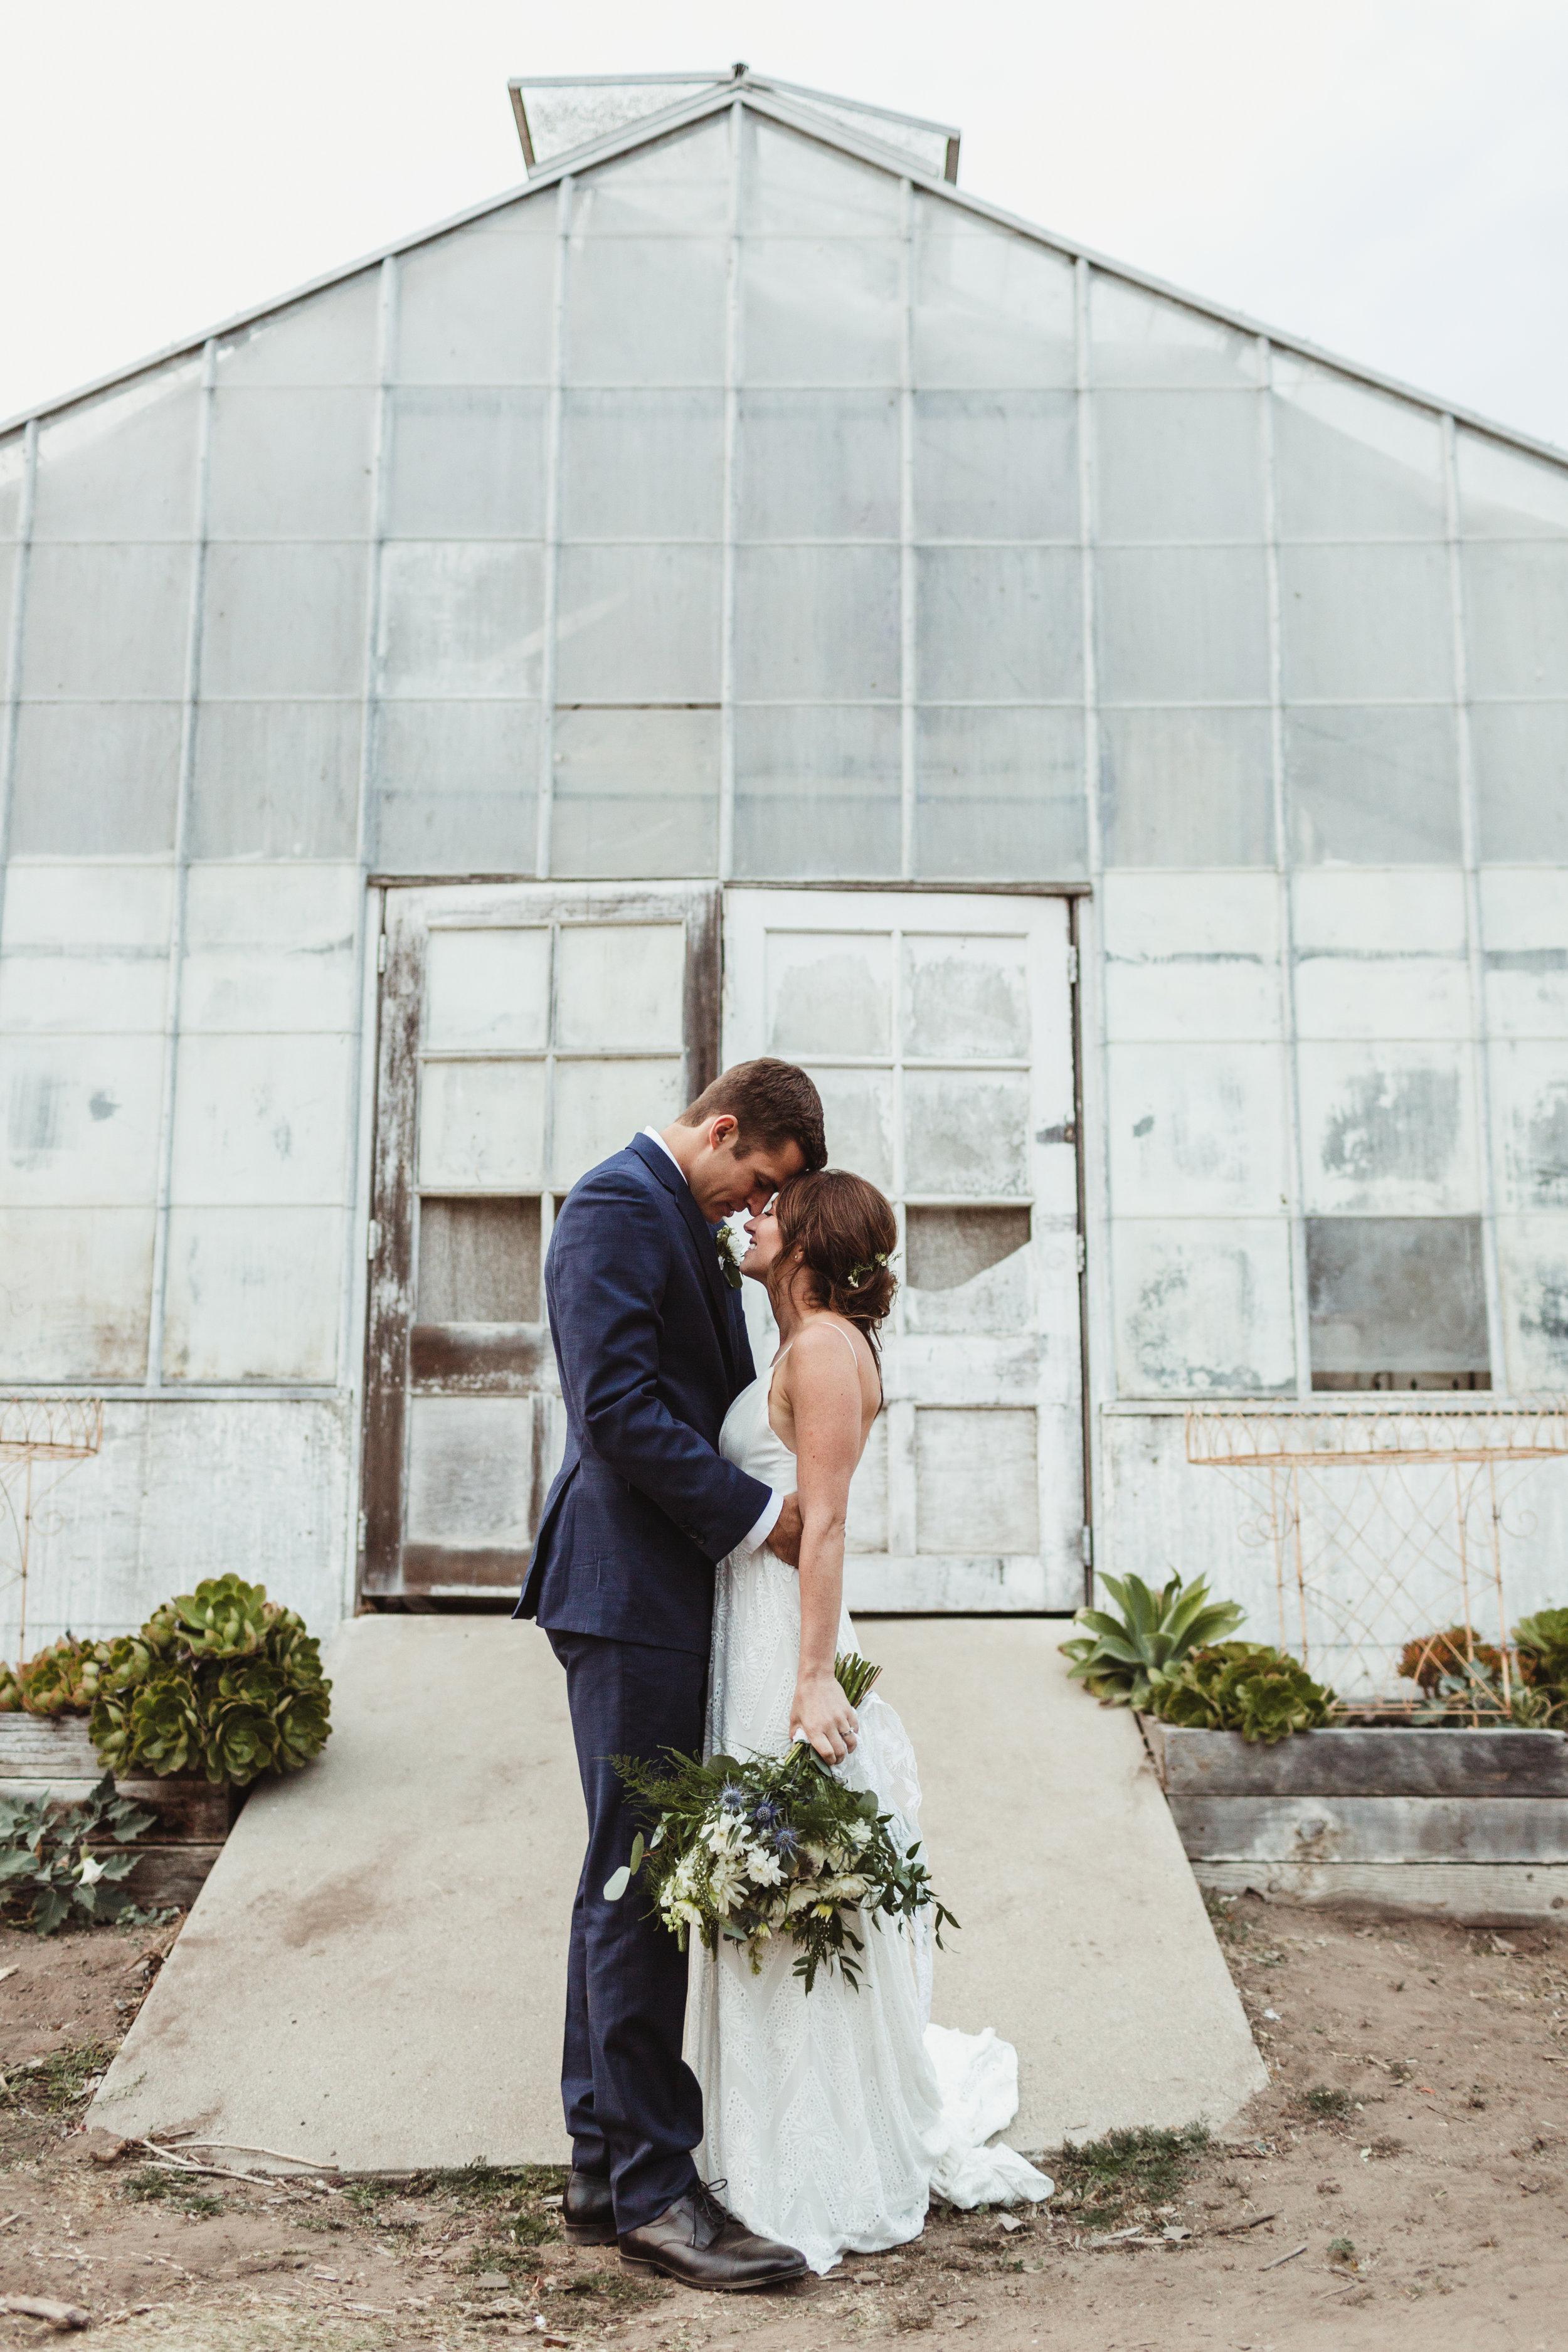 Jamie_English_Photography_JordanErik_Dos_Pueblos_Orchid_Wedding_Santa_Barbara_Fall2018-950.jpg